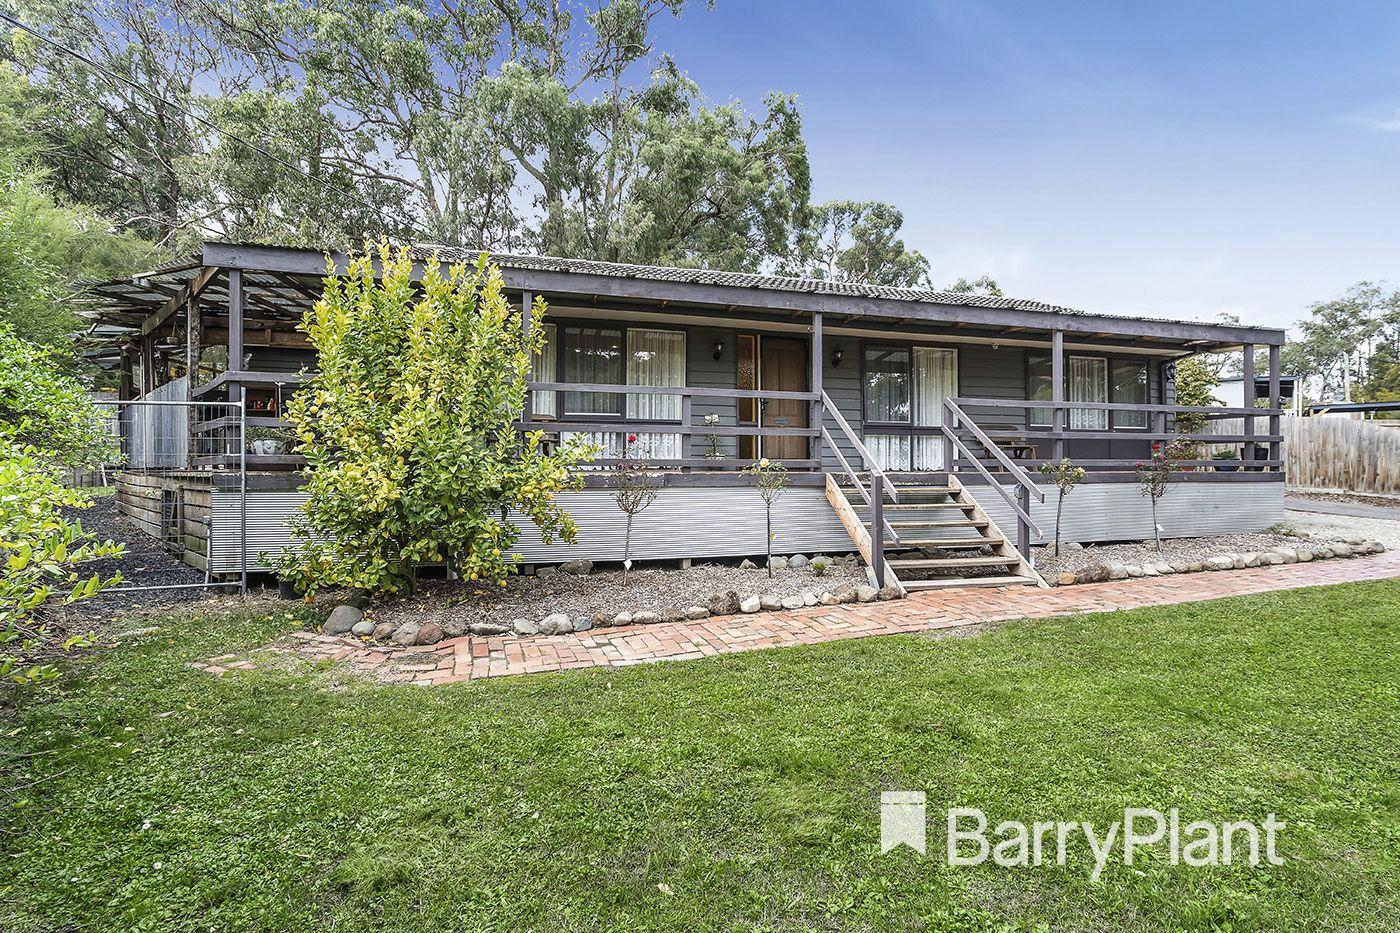 4 bedrooms House in 113 Badger Creek Road BADGER CREEK VIC, 3777